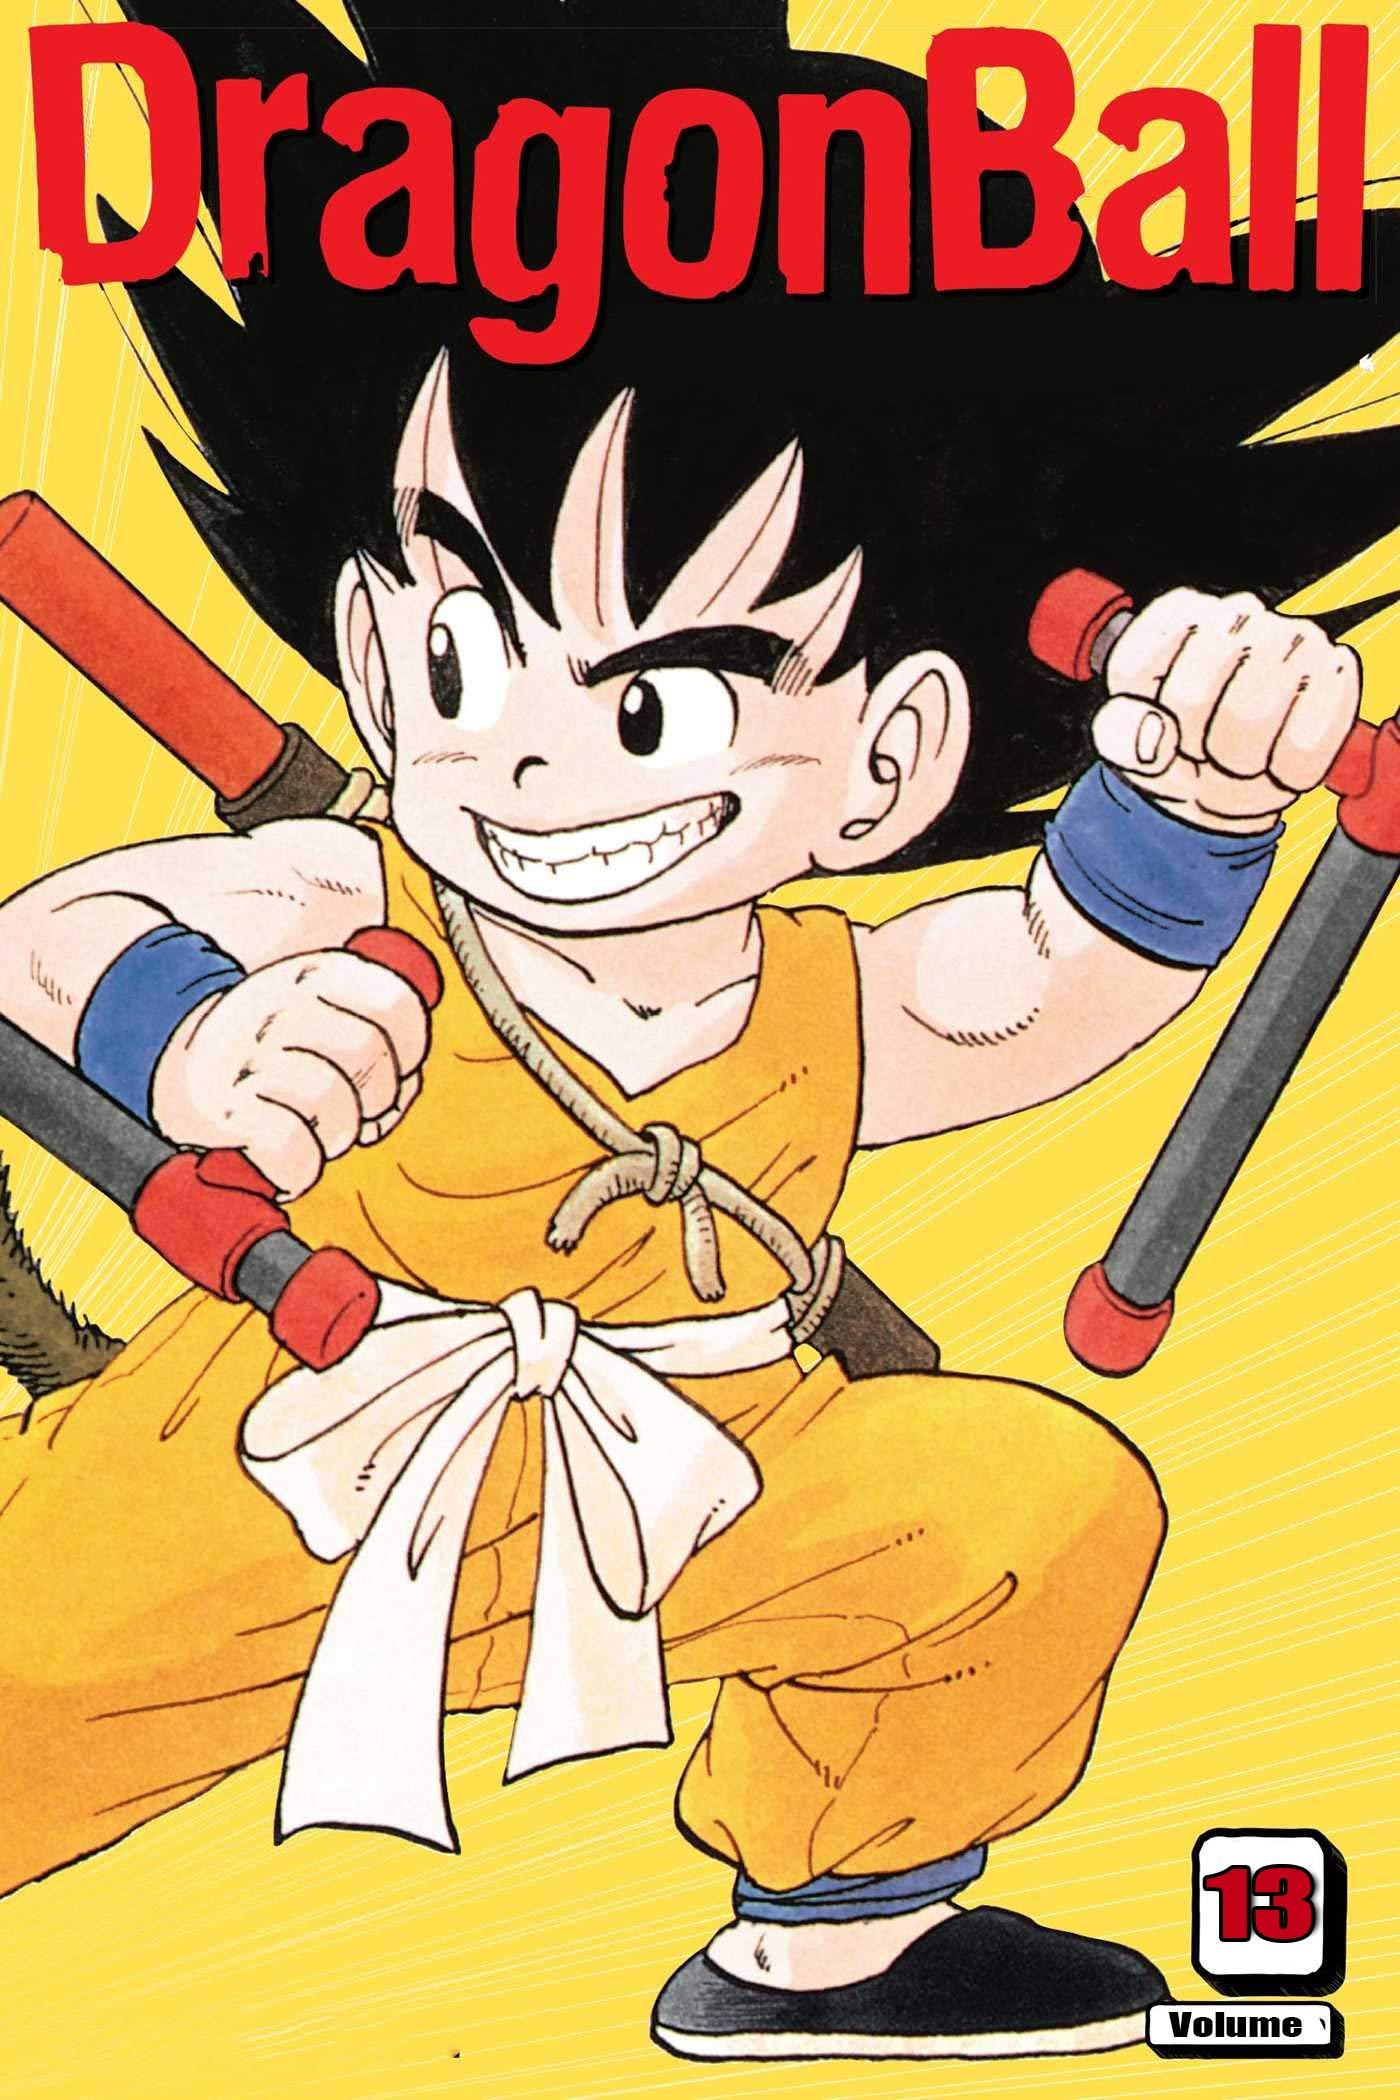 Best Manga: Dragon Ball Full series volume 13